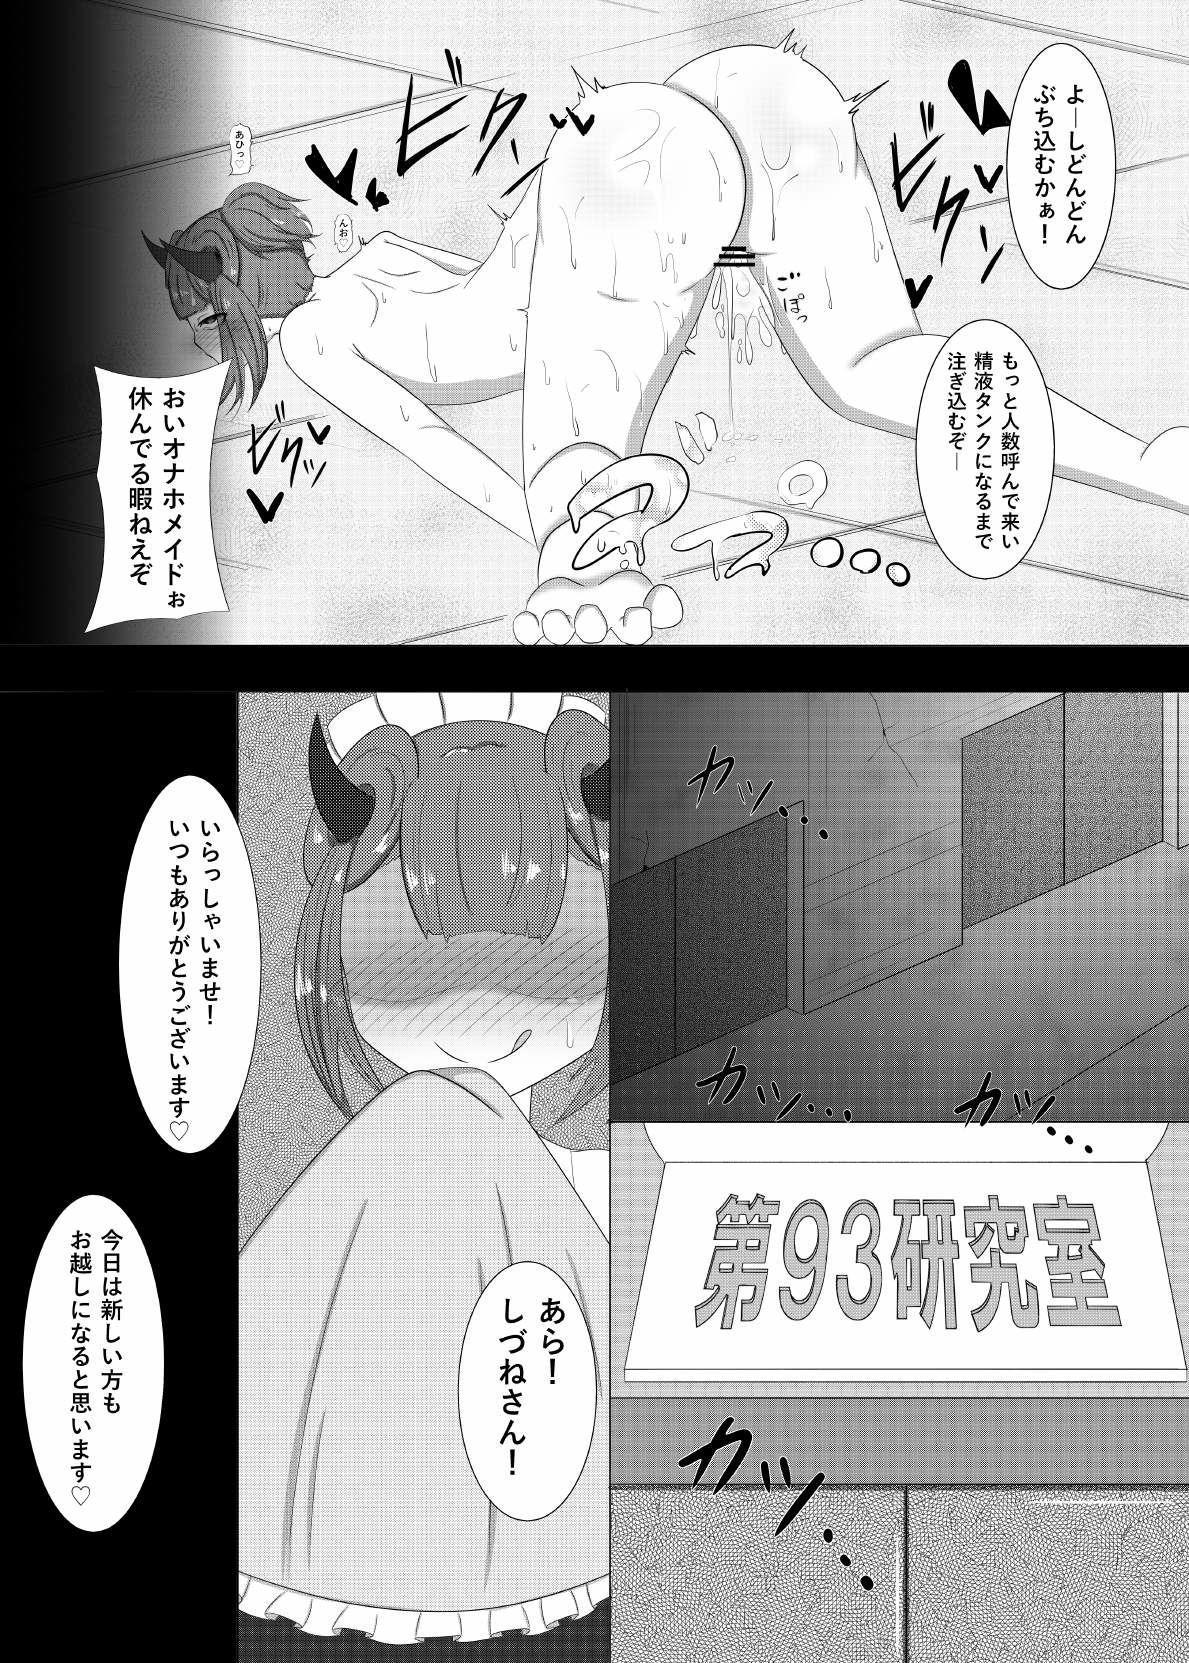 C93オマケ漫画 6